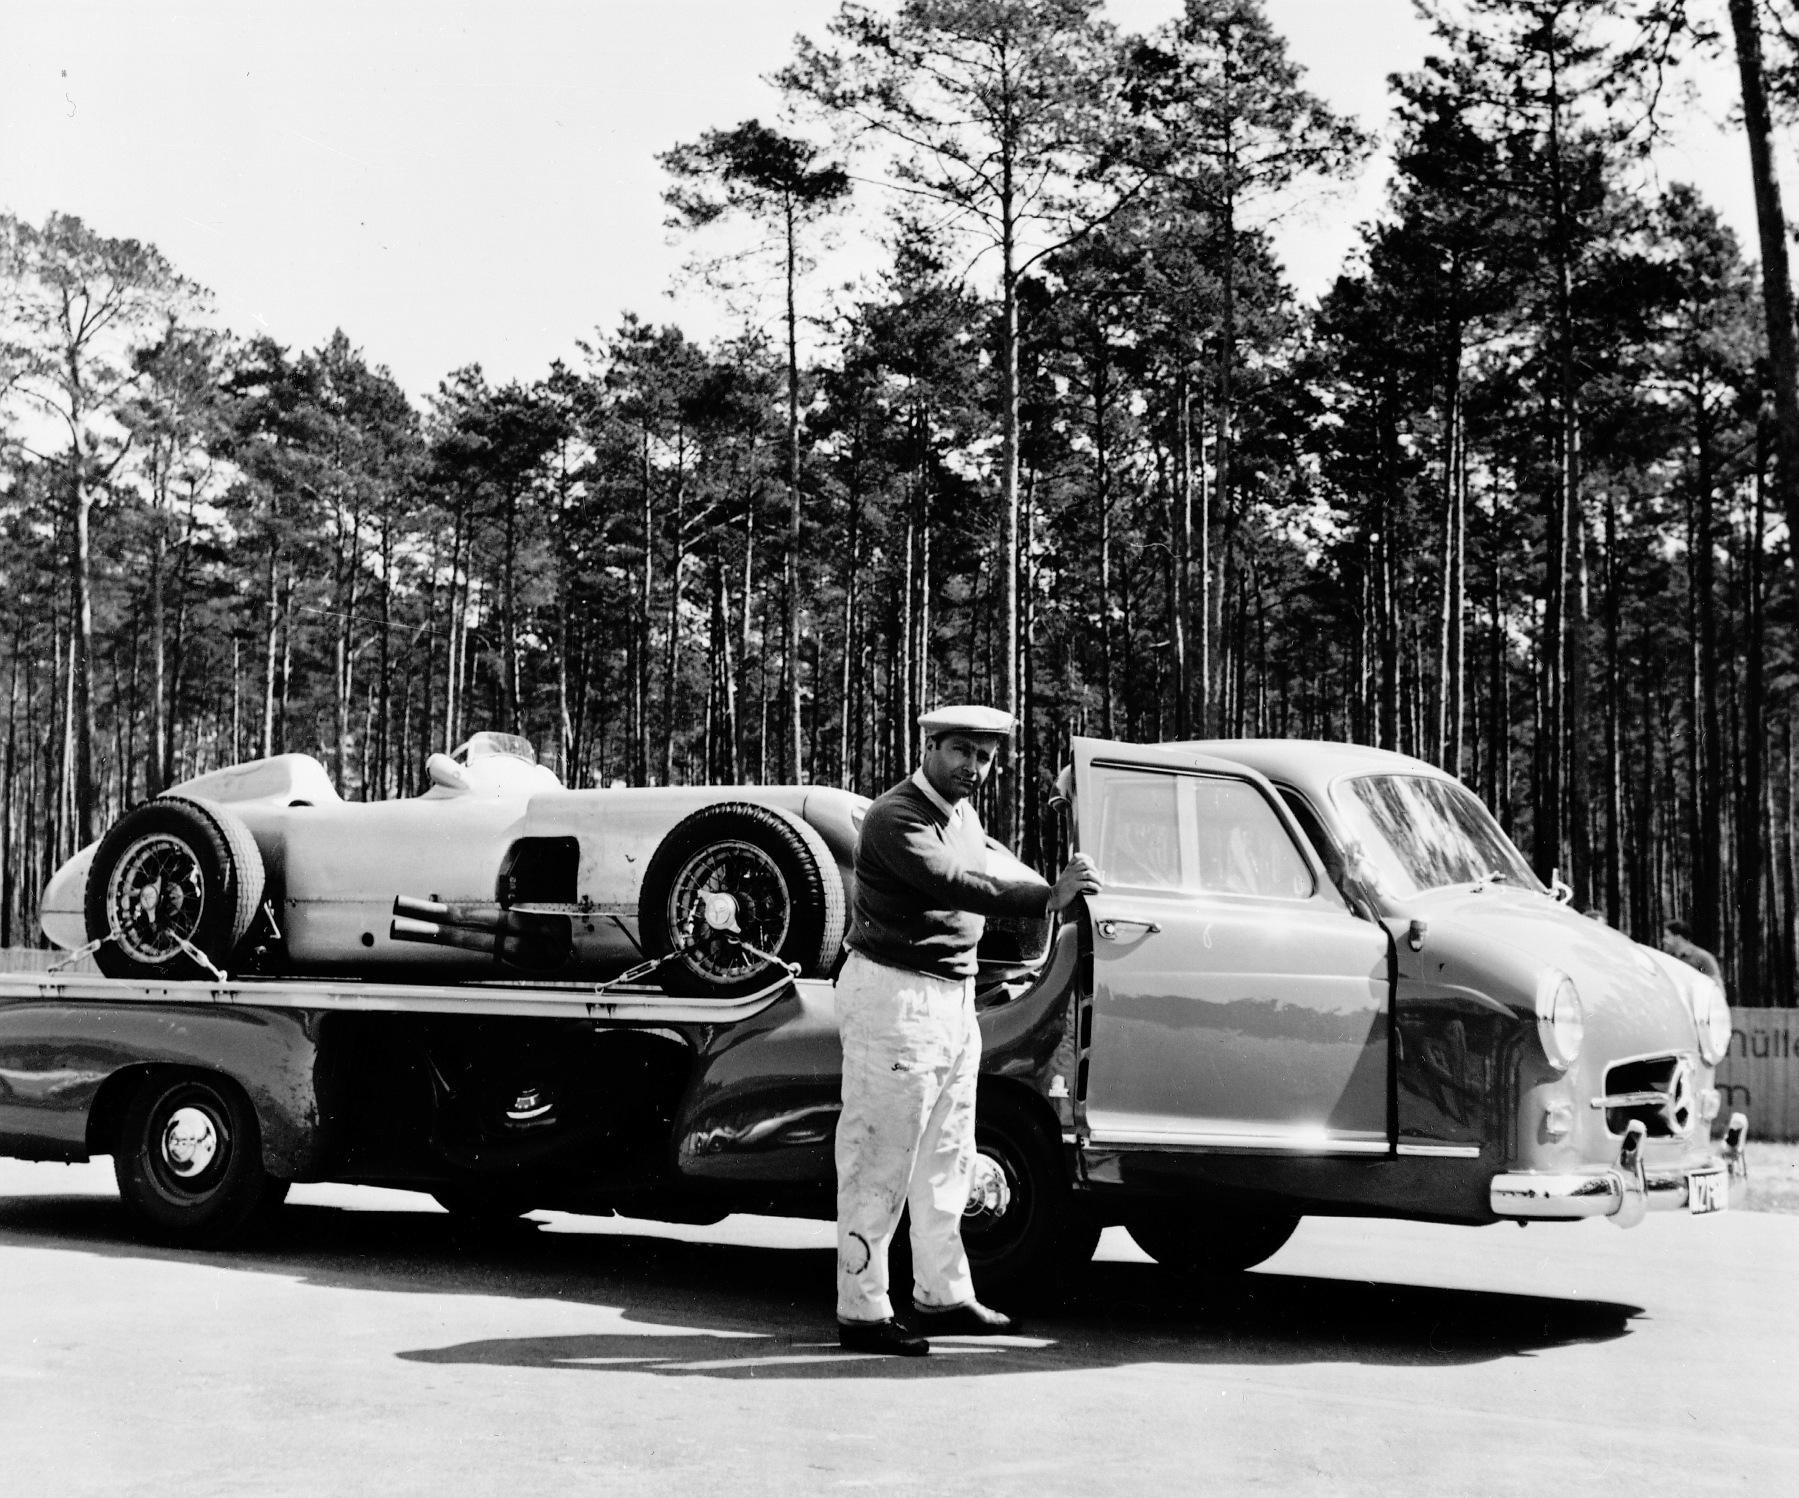 Mercedes benz blue wonder racing car transporter 1954 for Garage mercedes monaco